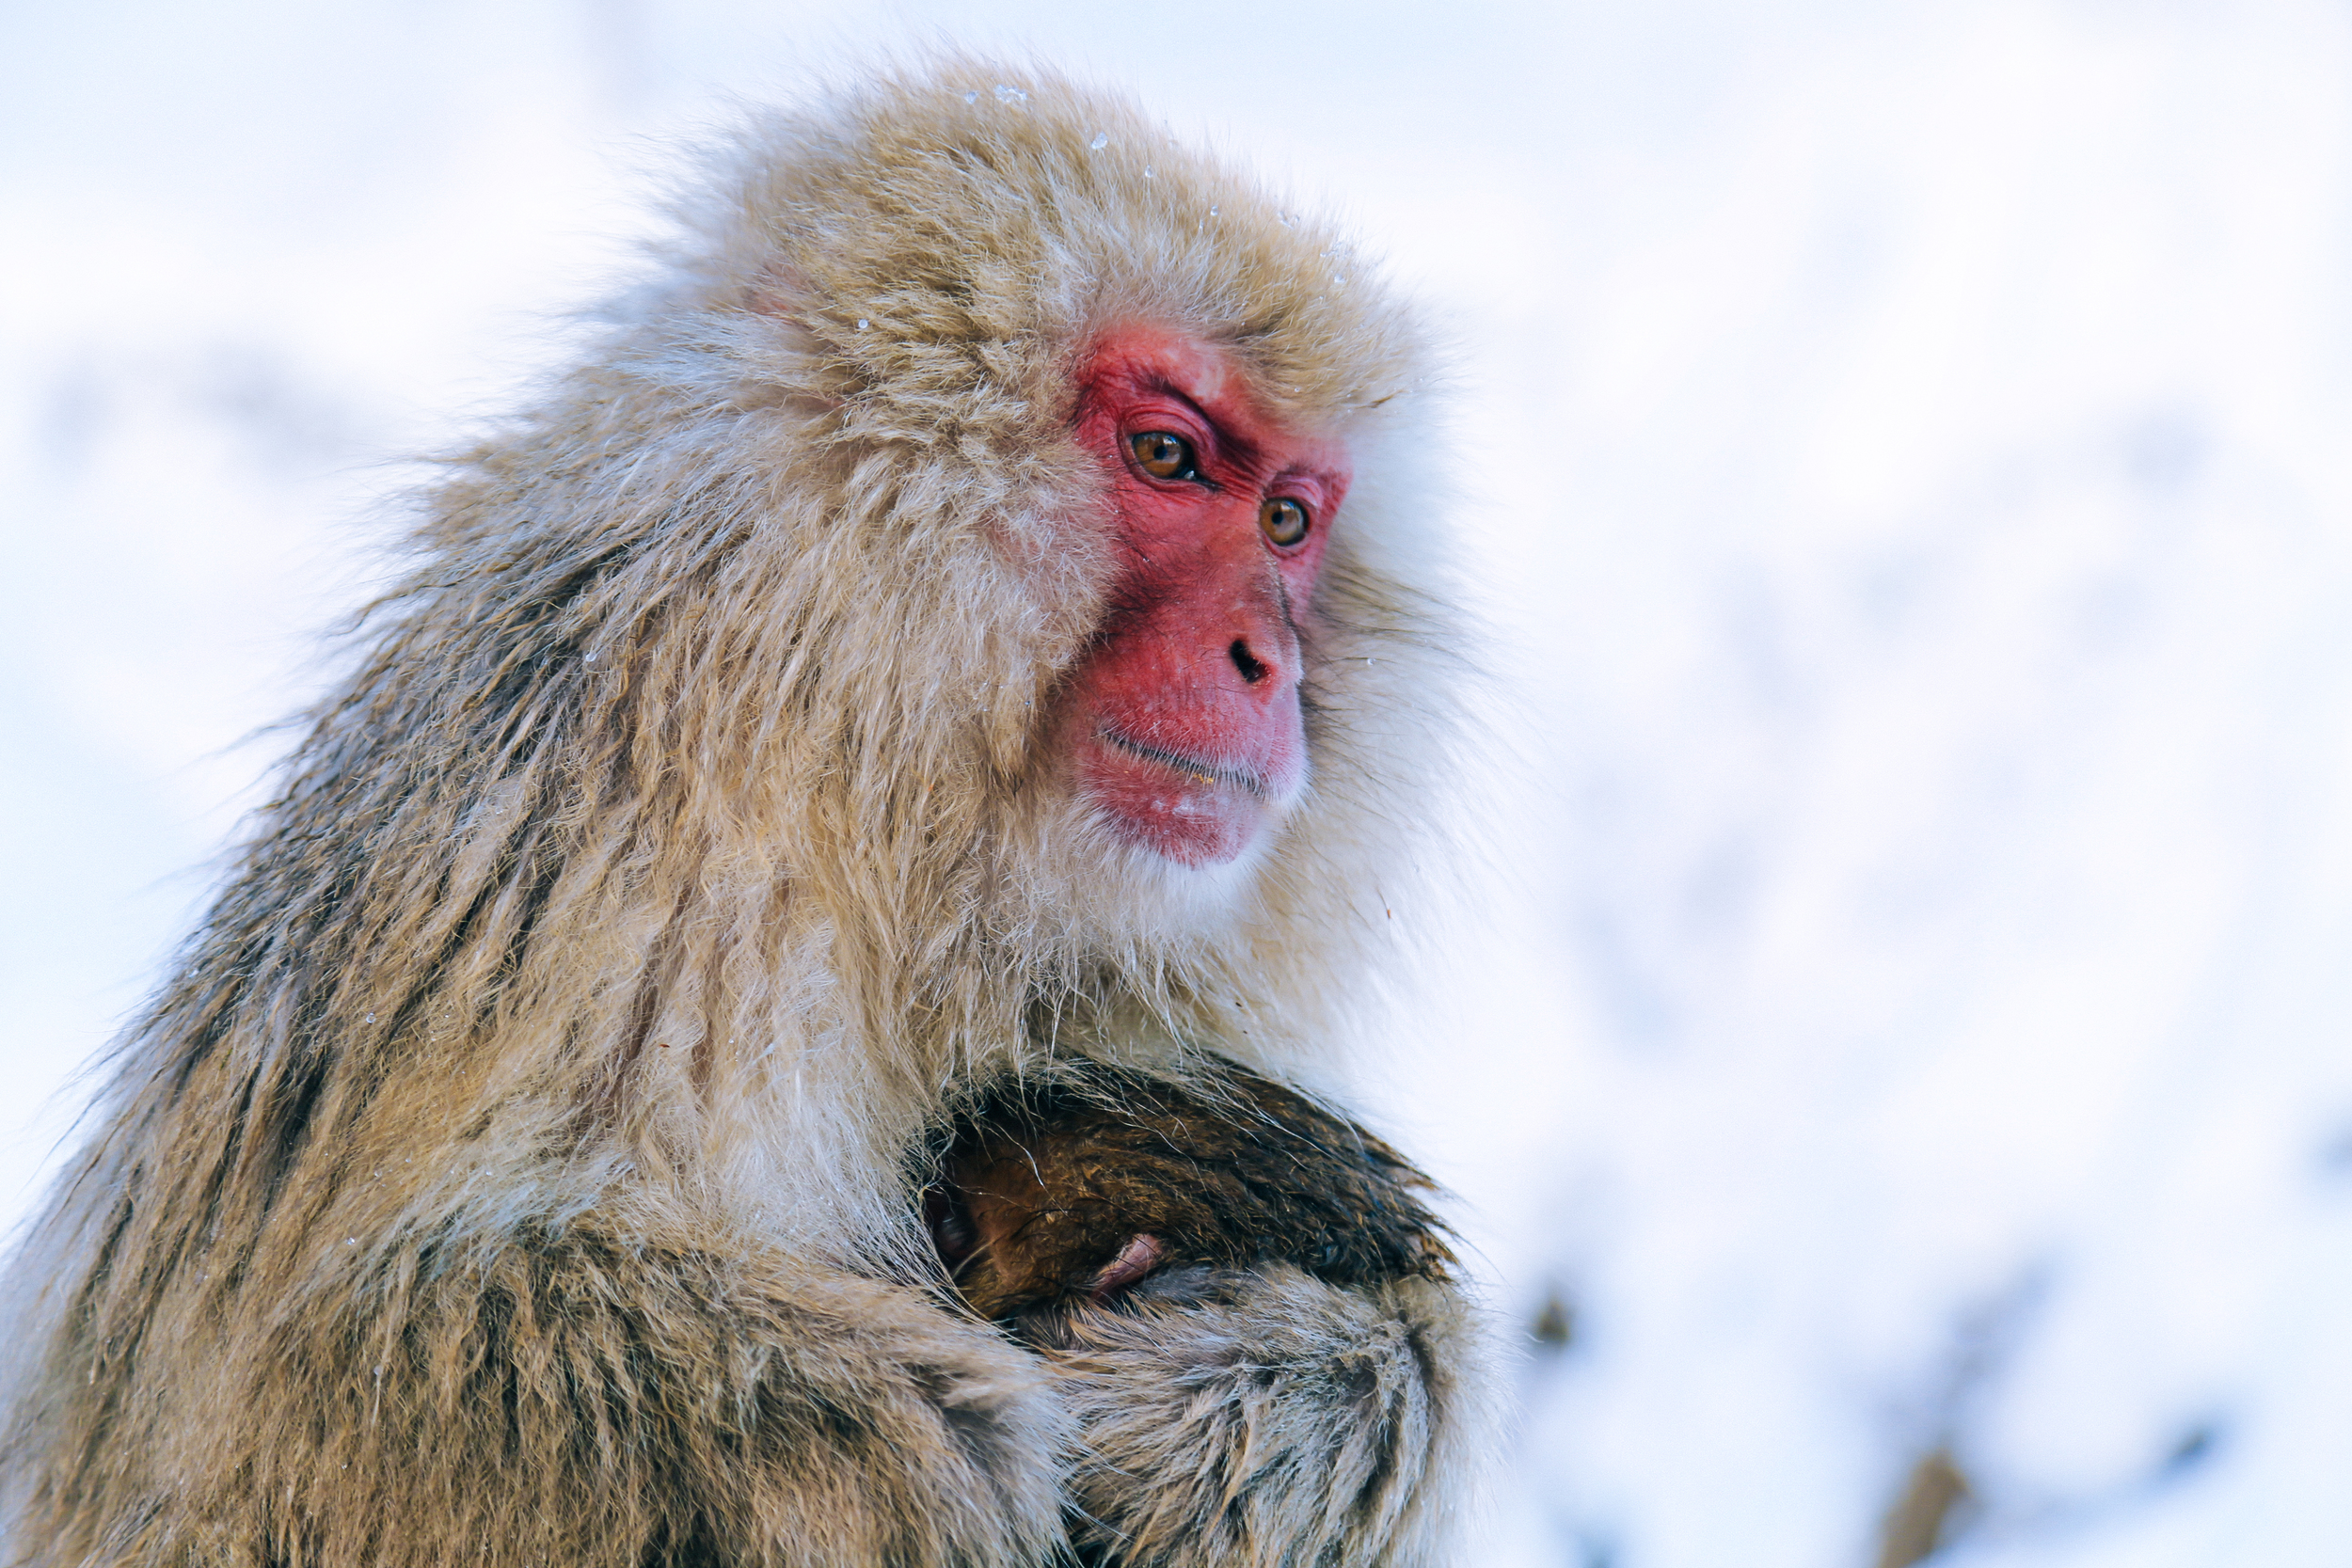 Snow Monkey & baby at Jigokudani Park - Eric Bravo Photography